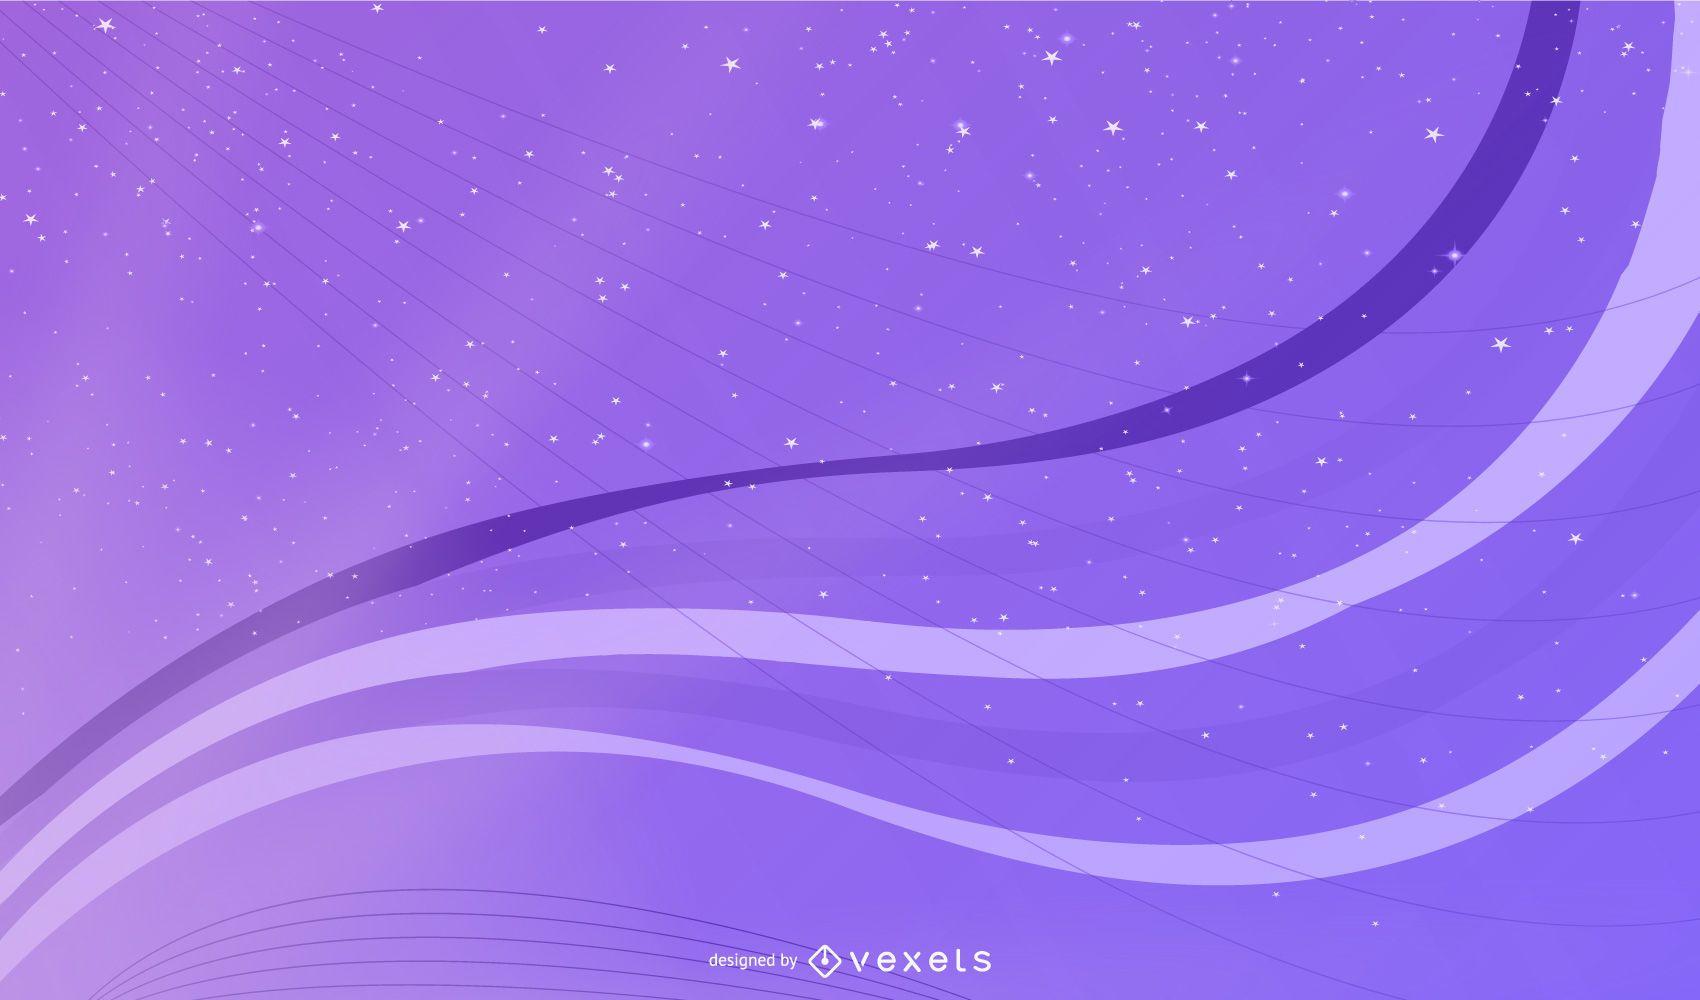 Glittery Purple Background with Sunlight Shade